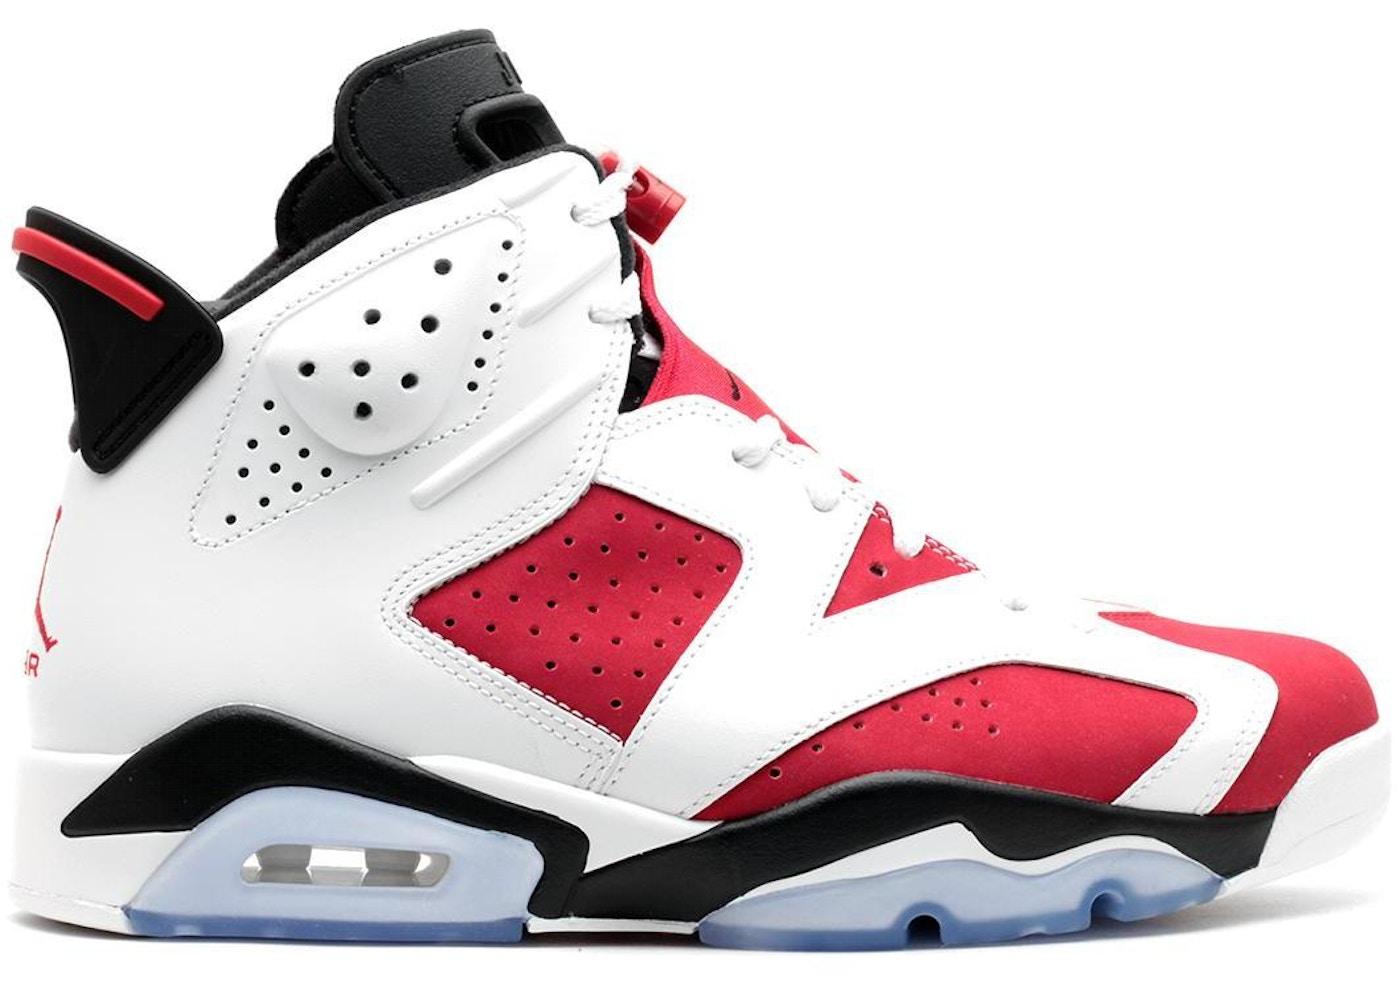 outlet store 440ae f673c Buy Air Jordan 6 Shoes & Deadstock Sneakers